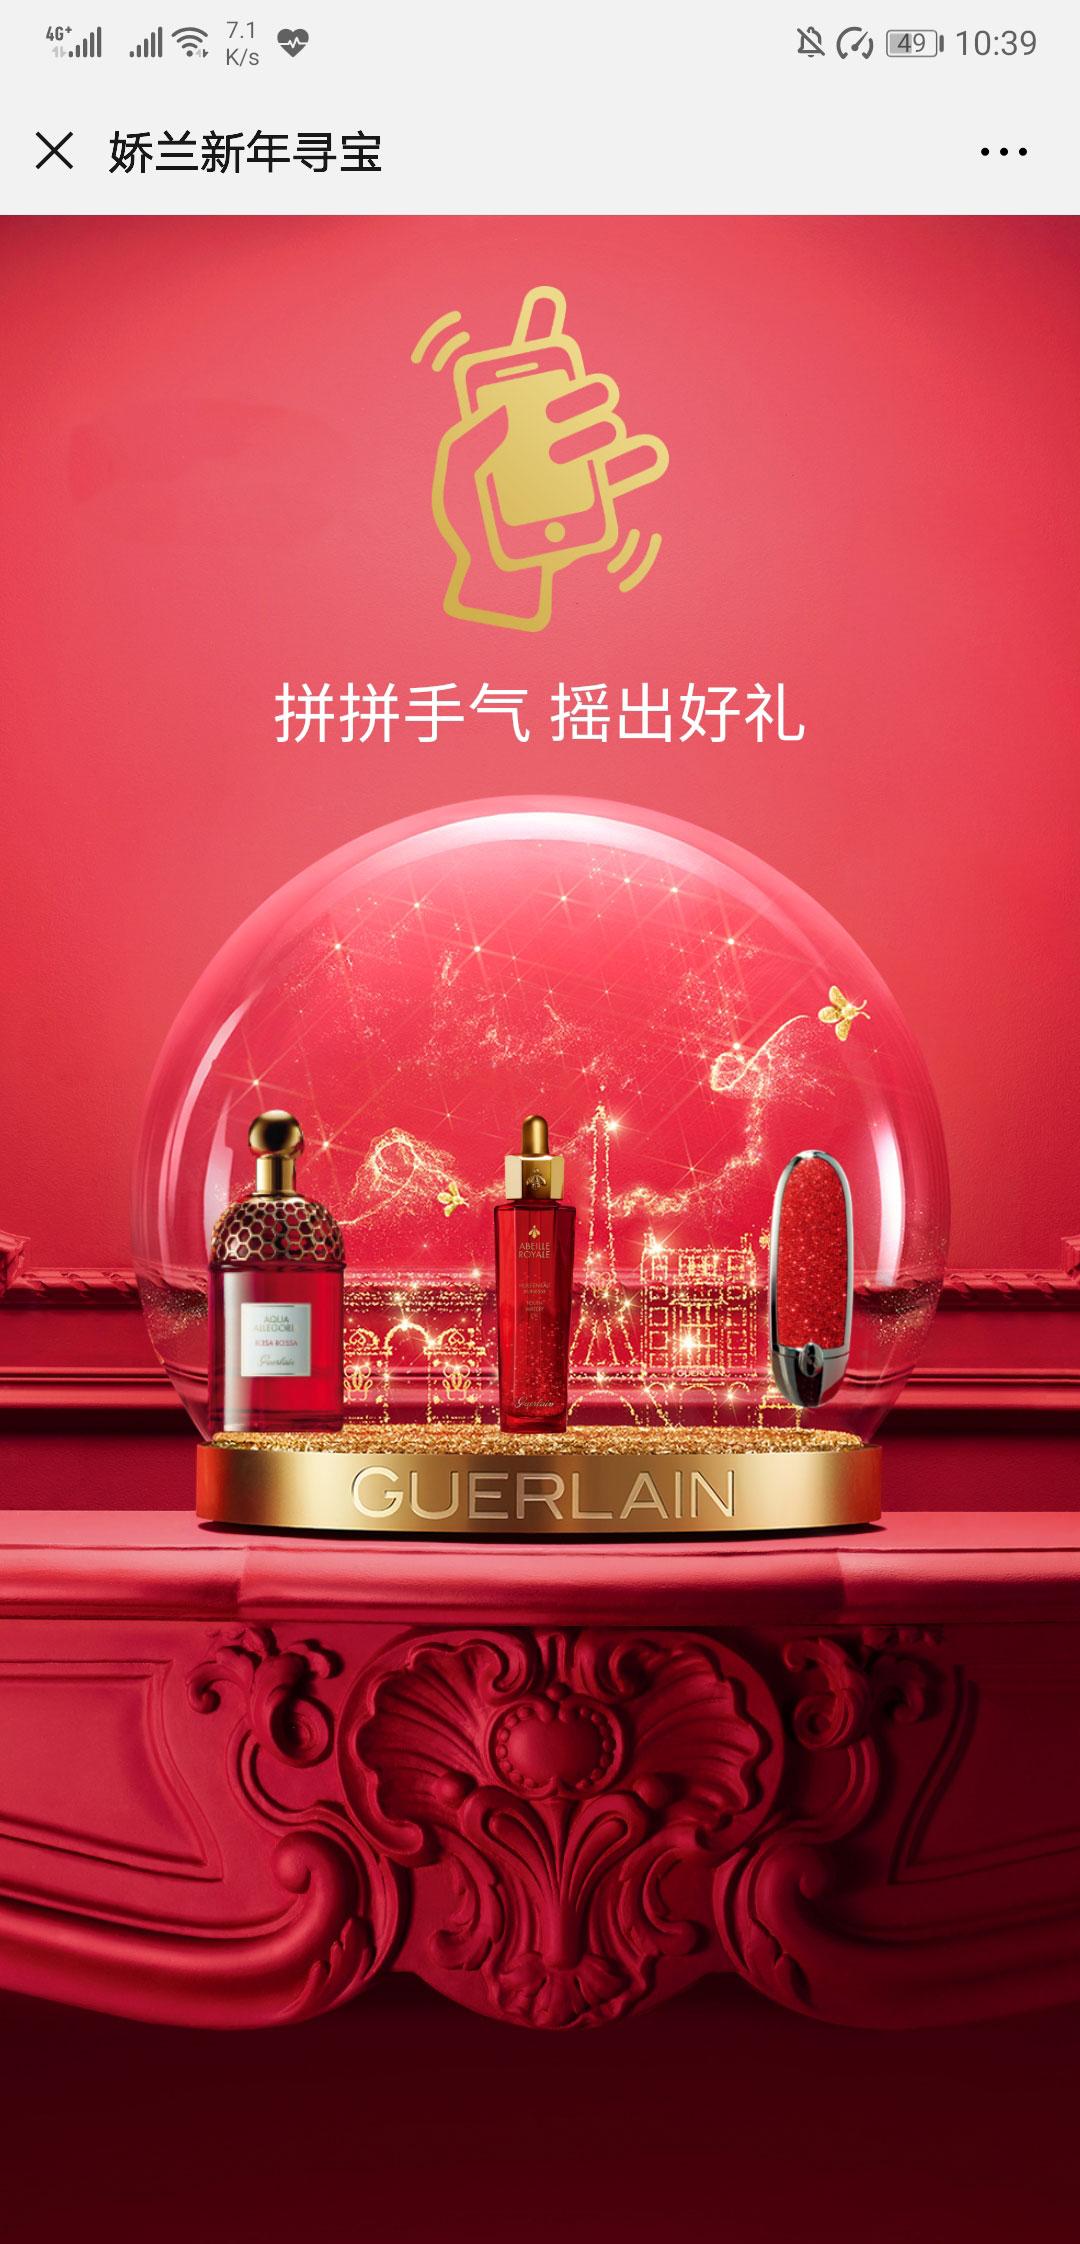 Guerlain CNY WeChat Shake campaign